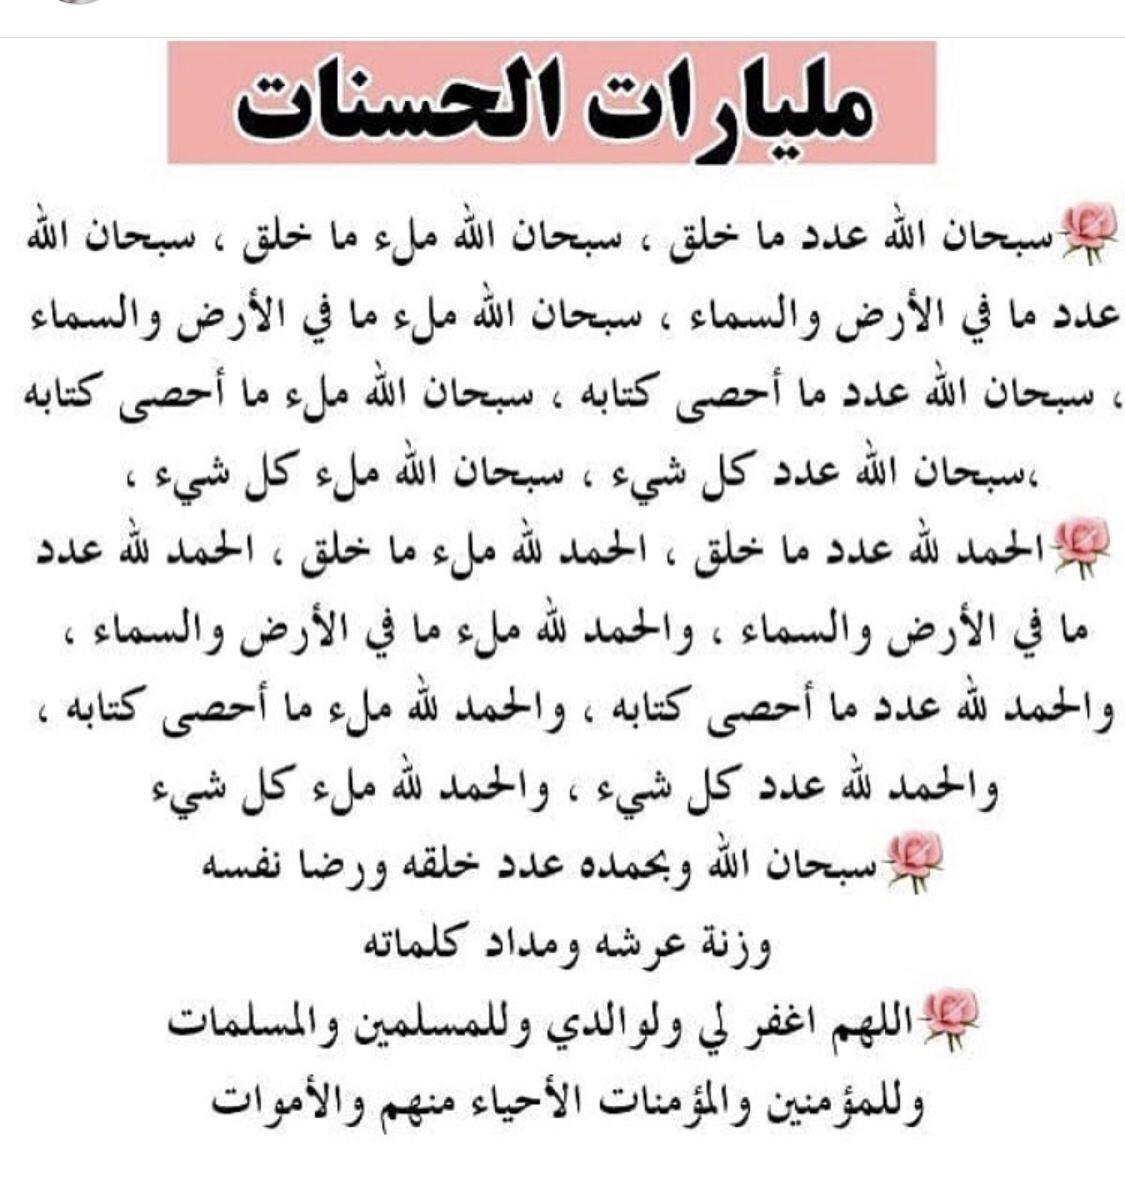 Pin By Fawoz Matoq On ادعية Islamic Love Quotes Quran Quotes Love Islamic Phrases